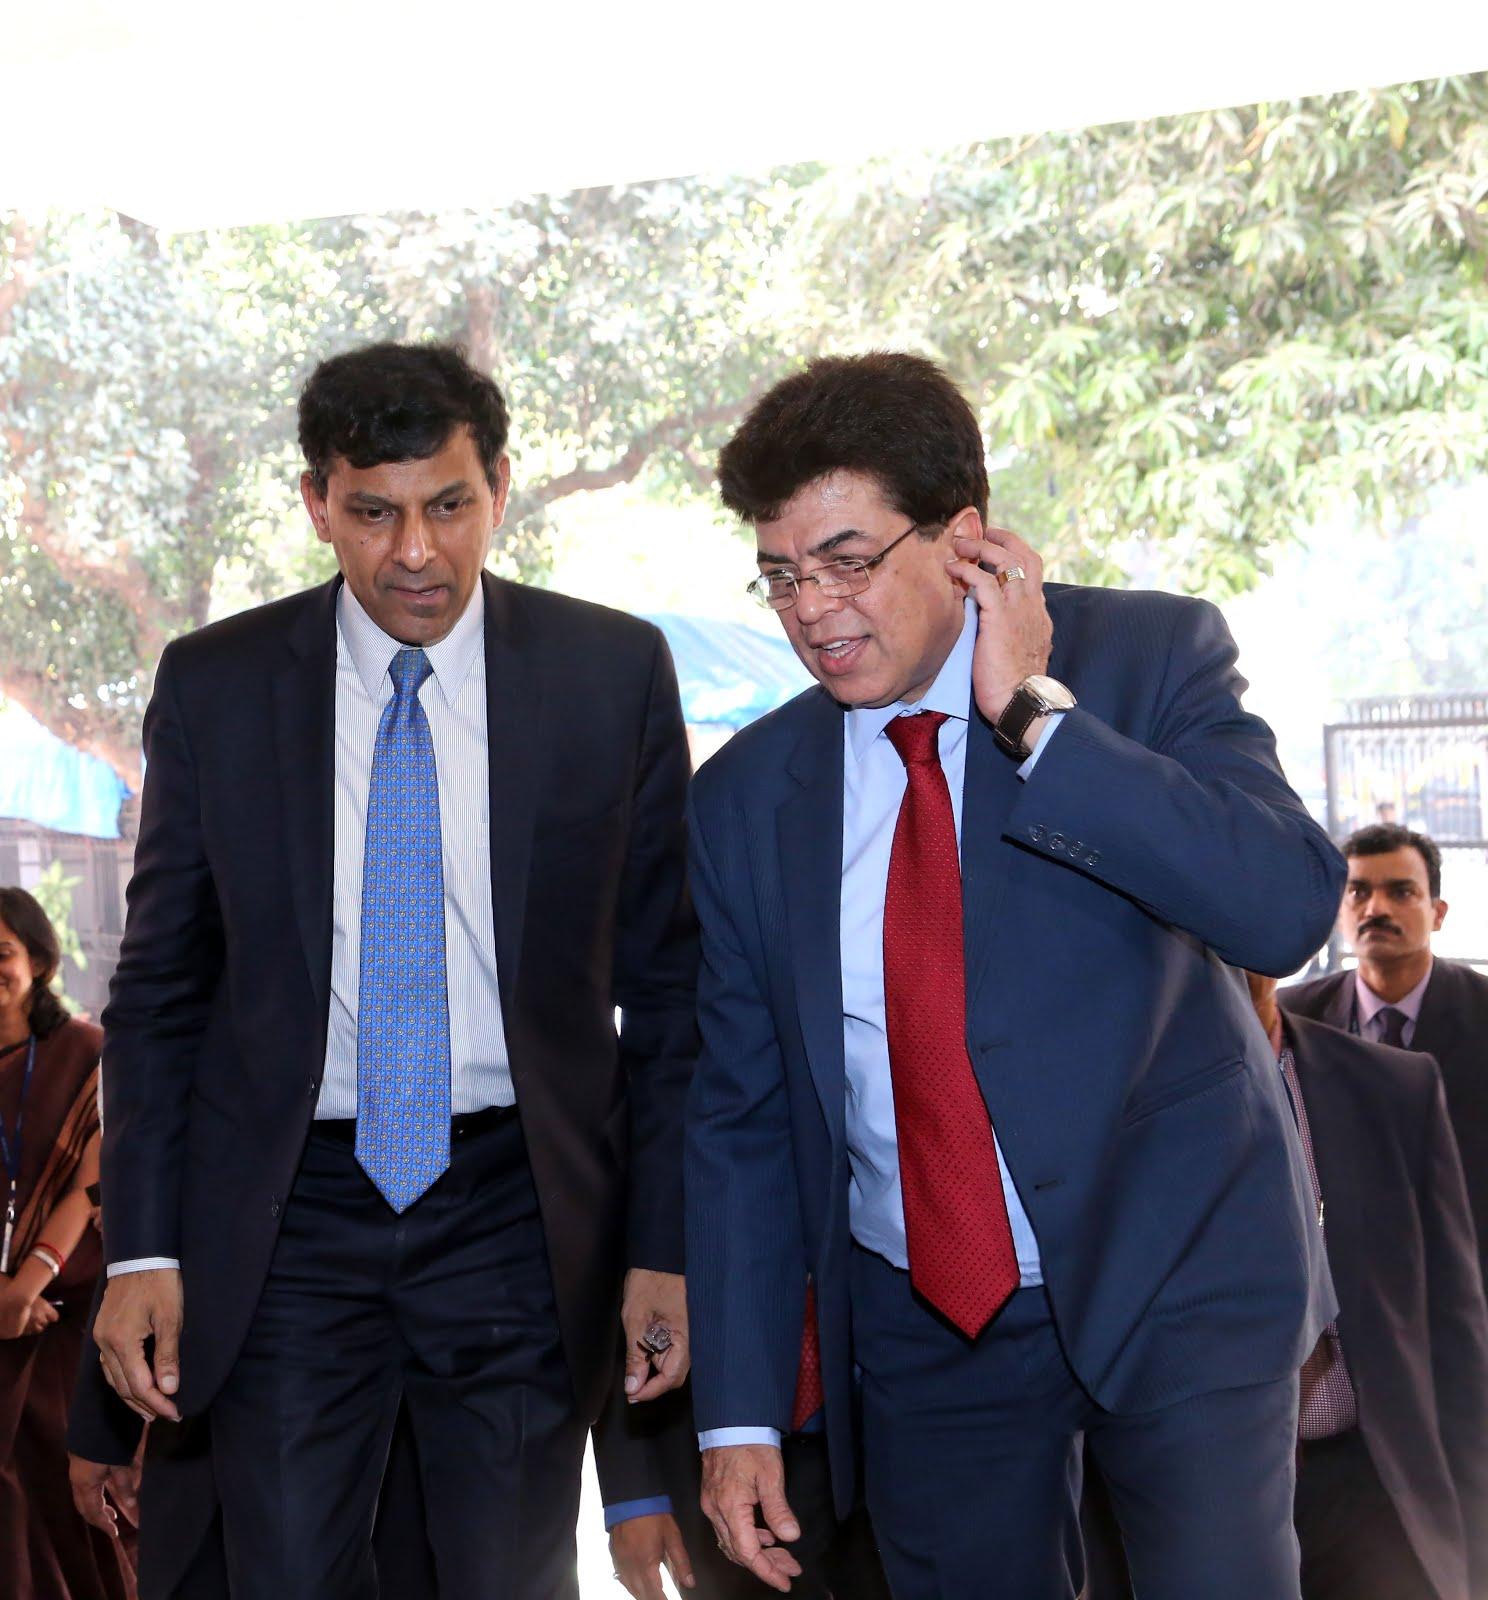 With the Former Governor of RBI Mr Raguram Rajan at DDK Mumbai